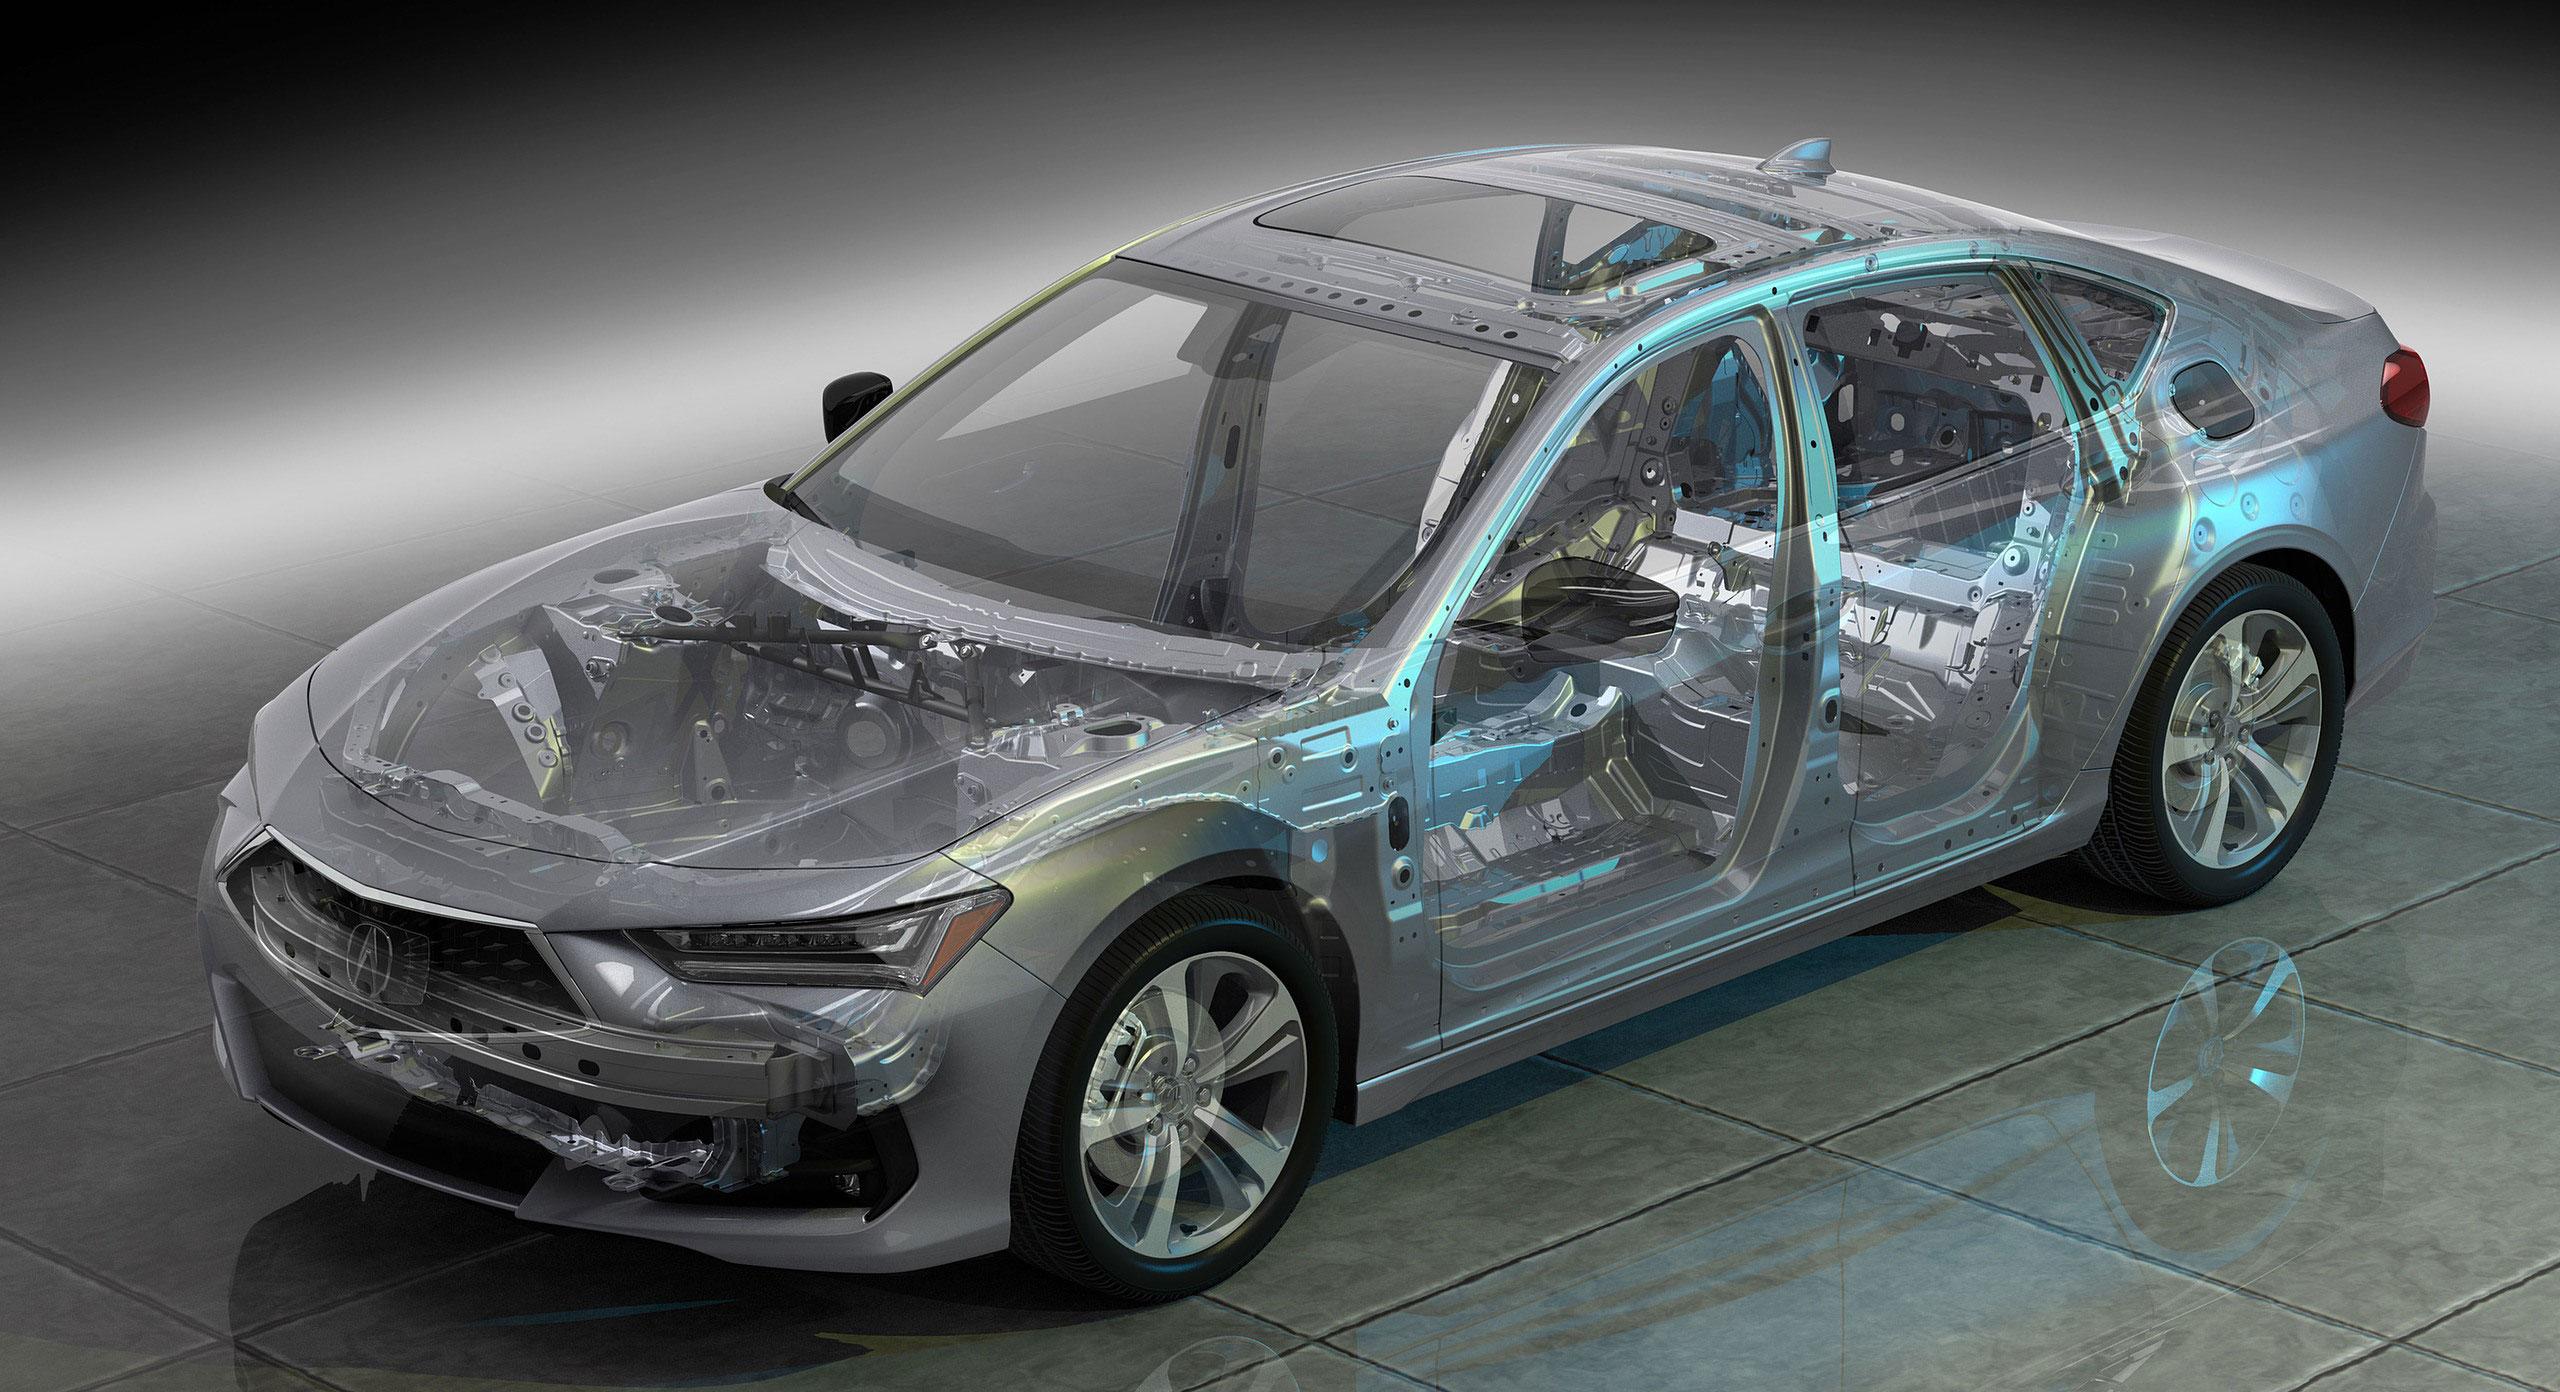 Acura TLX cutaway drawing